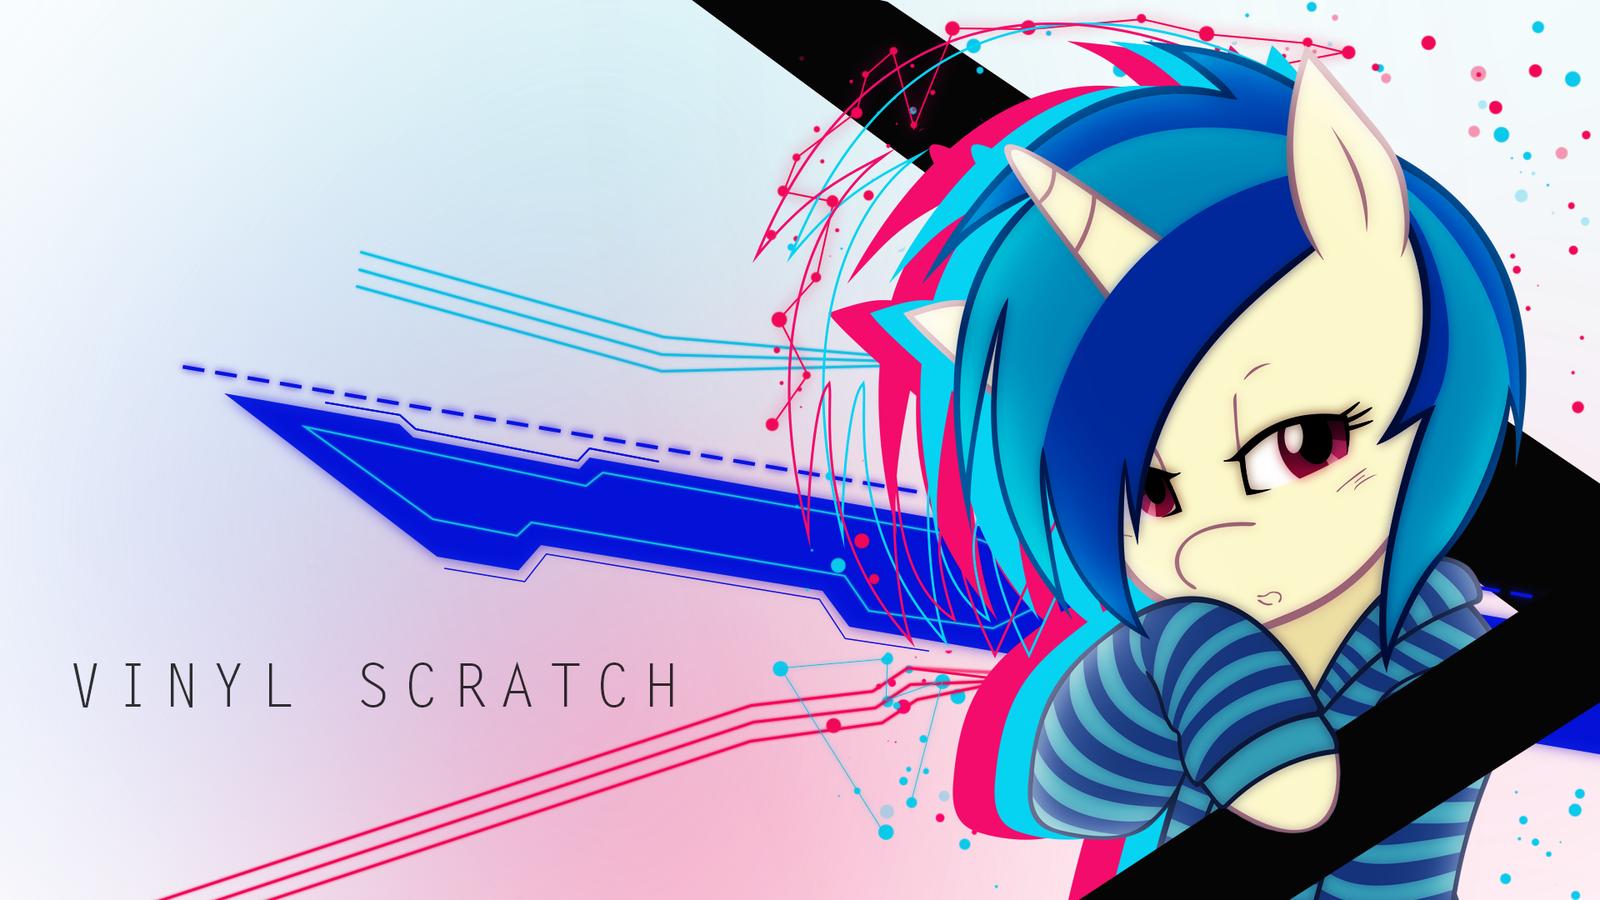 Vinyl Scratch Wallpaper Vinyl Scratch W...